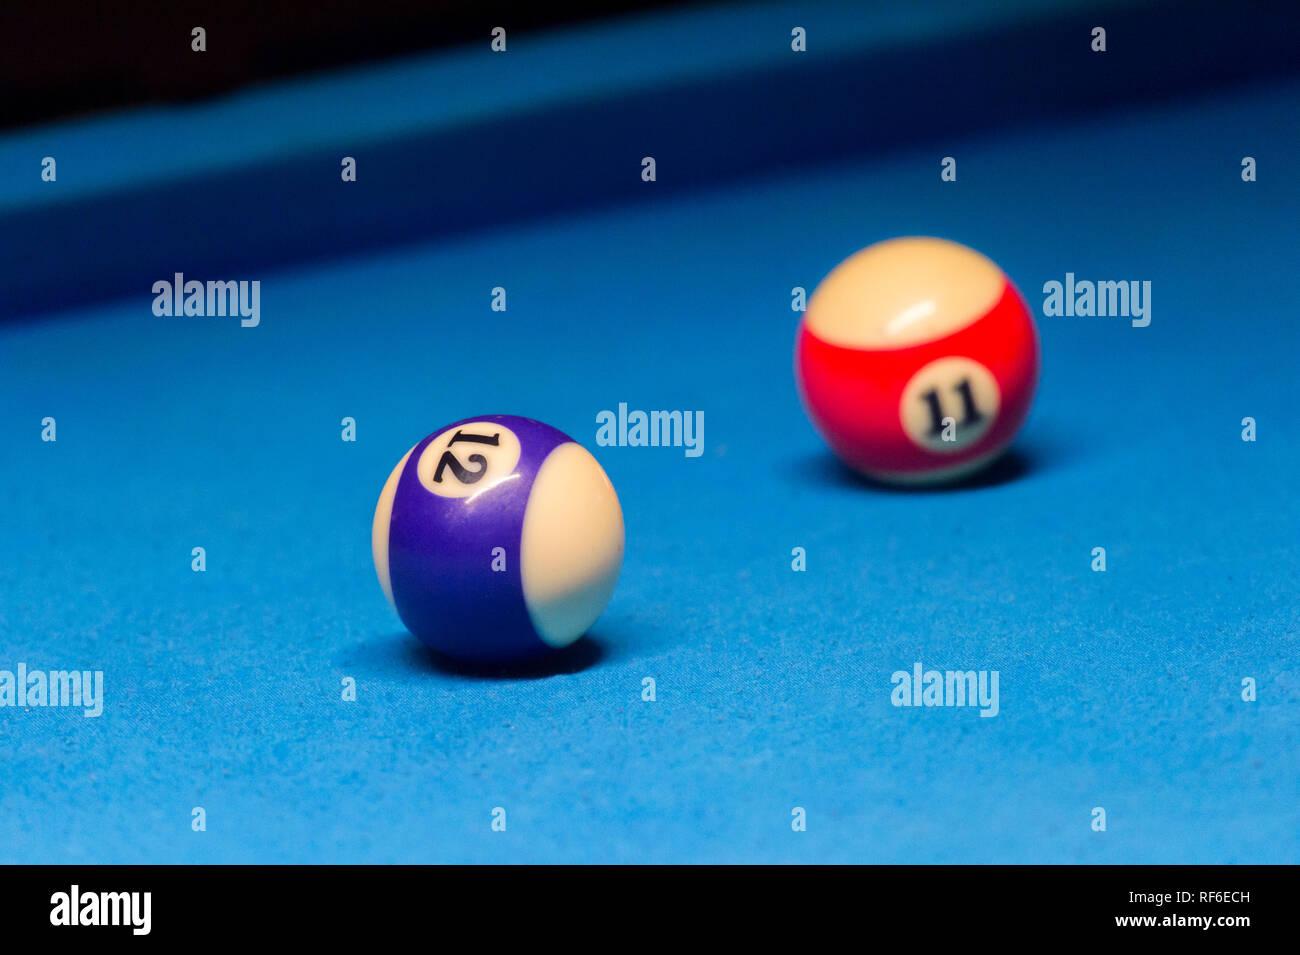 Colorful Billiards Balls. Billiard Ball At Blue Table. Colorful American  Pool Snooker Balls Background. American Billiard In Bar. Close Up Billiard  Ba